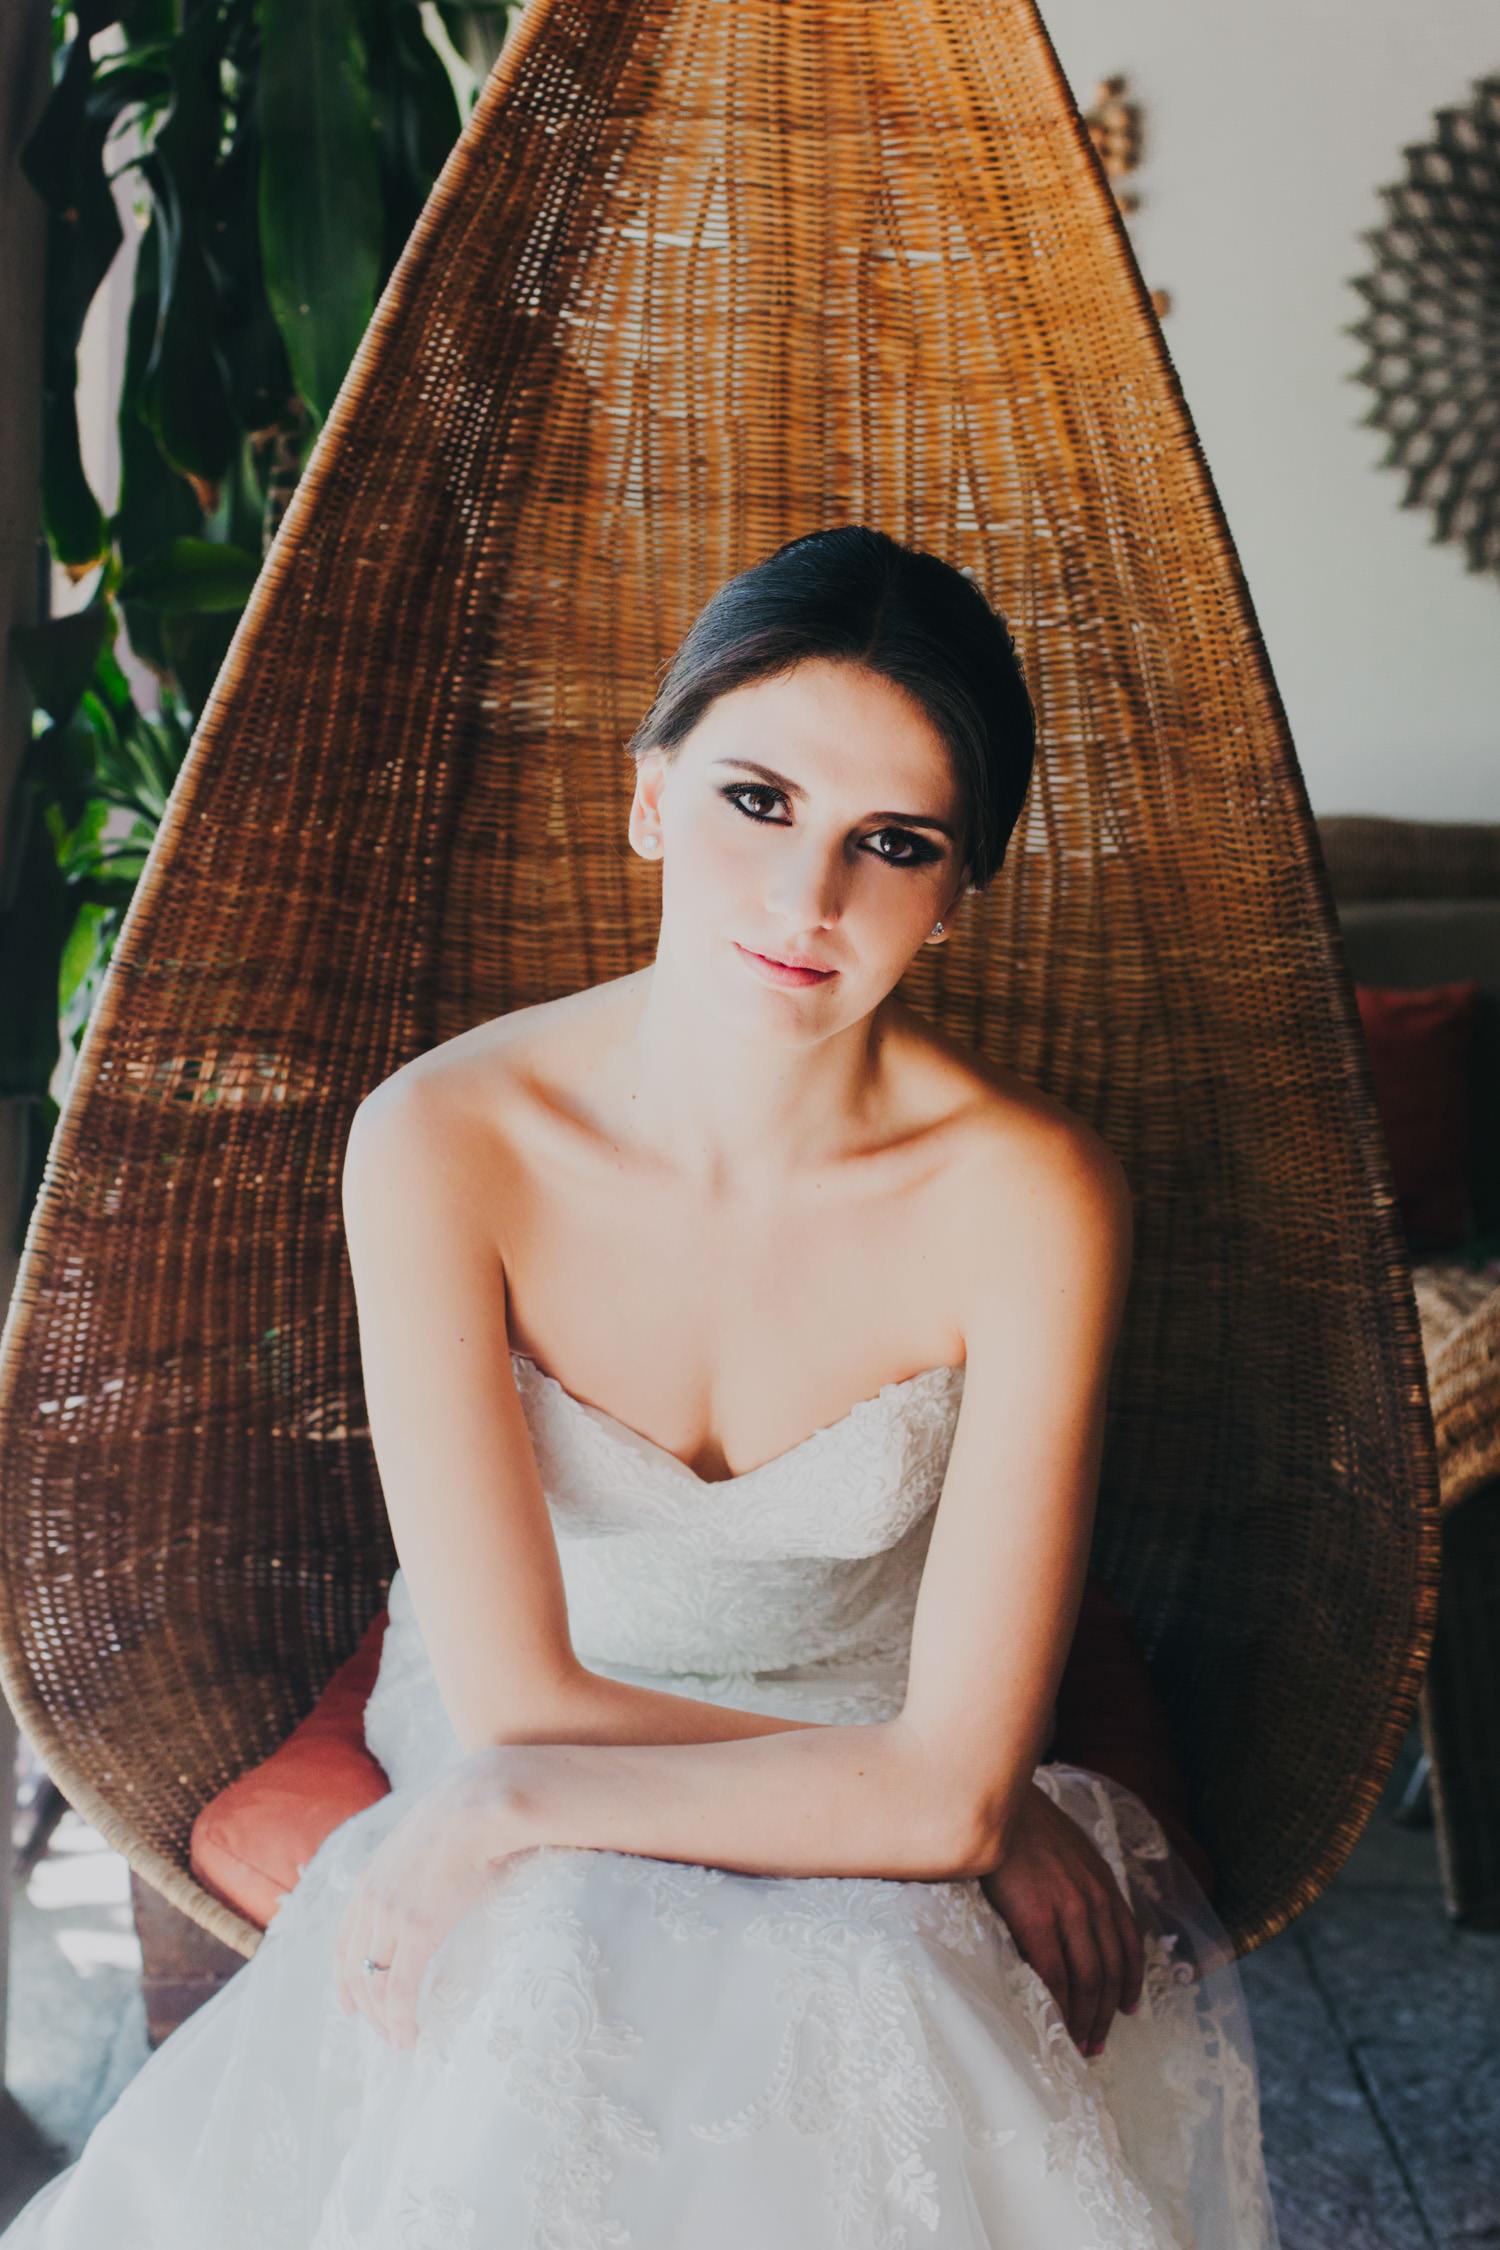 irapuato-boda-fotografia-jardines-alcalde-guanajuato-paulina-juan-pedro--6.jpg